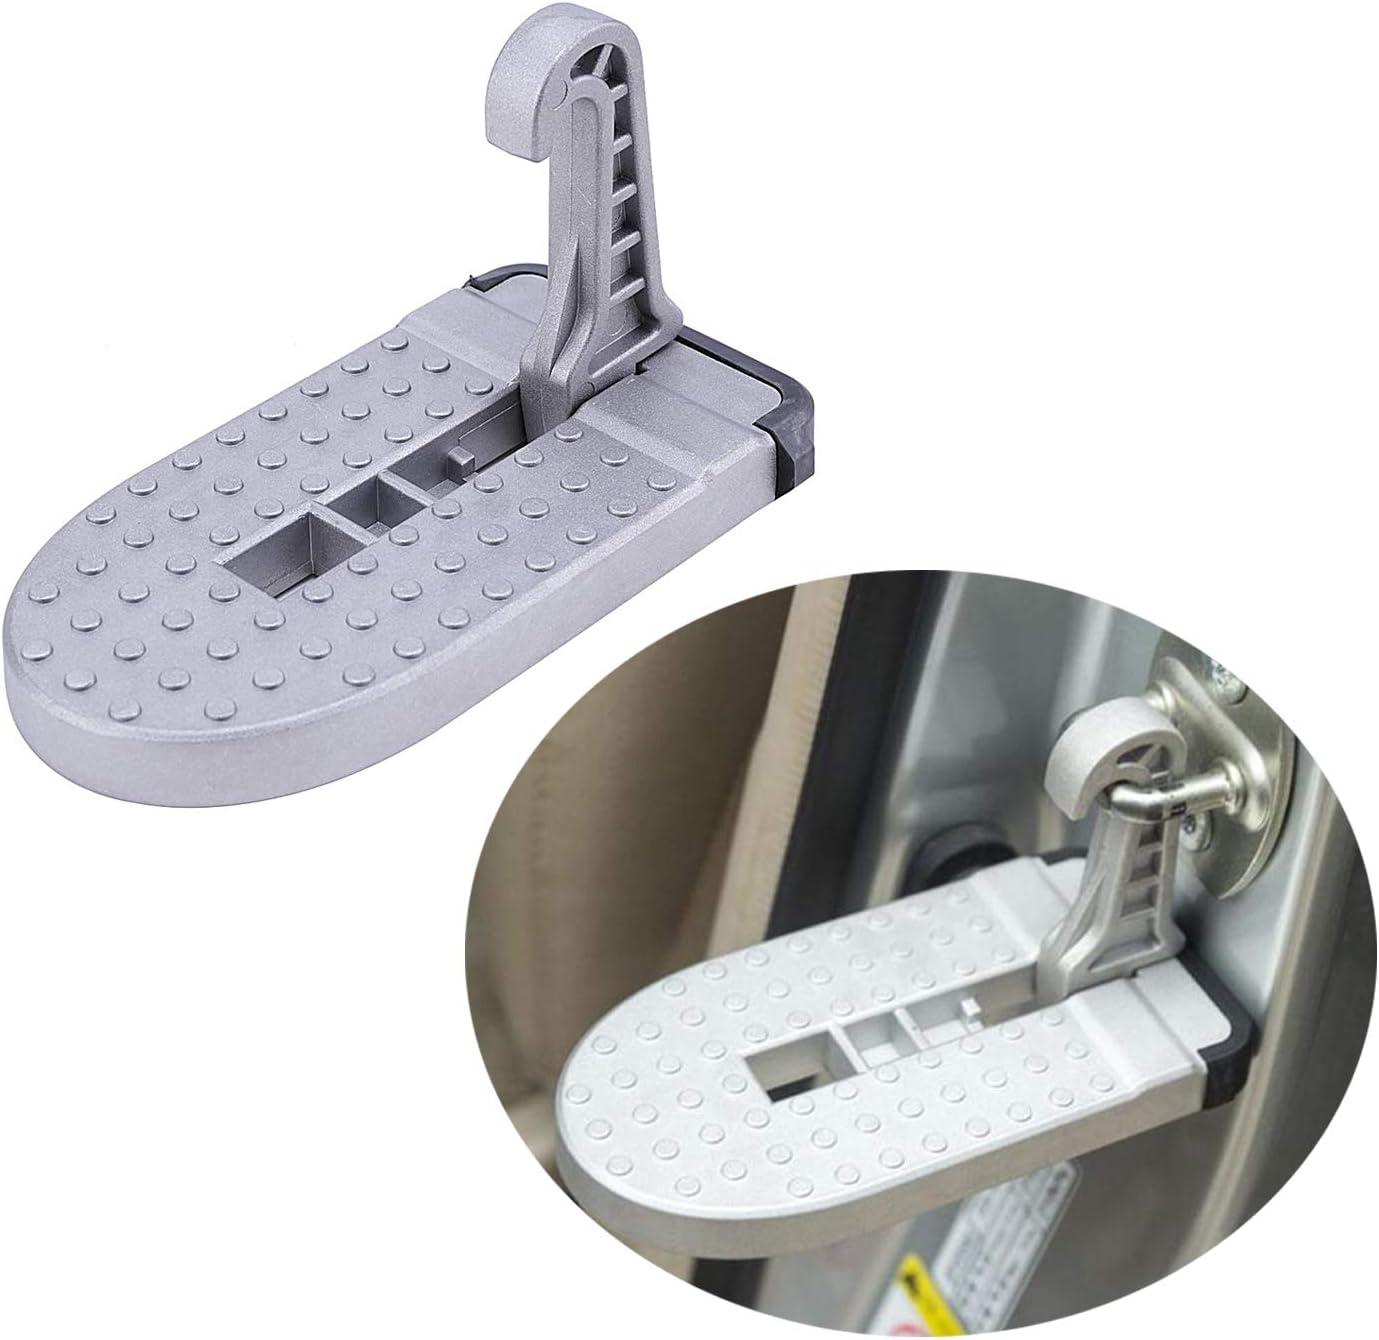 LFOTPP Vitara Jimny SUV - Pedal plegable para puerta de coche (aleación de aluminio)